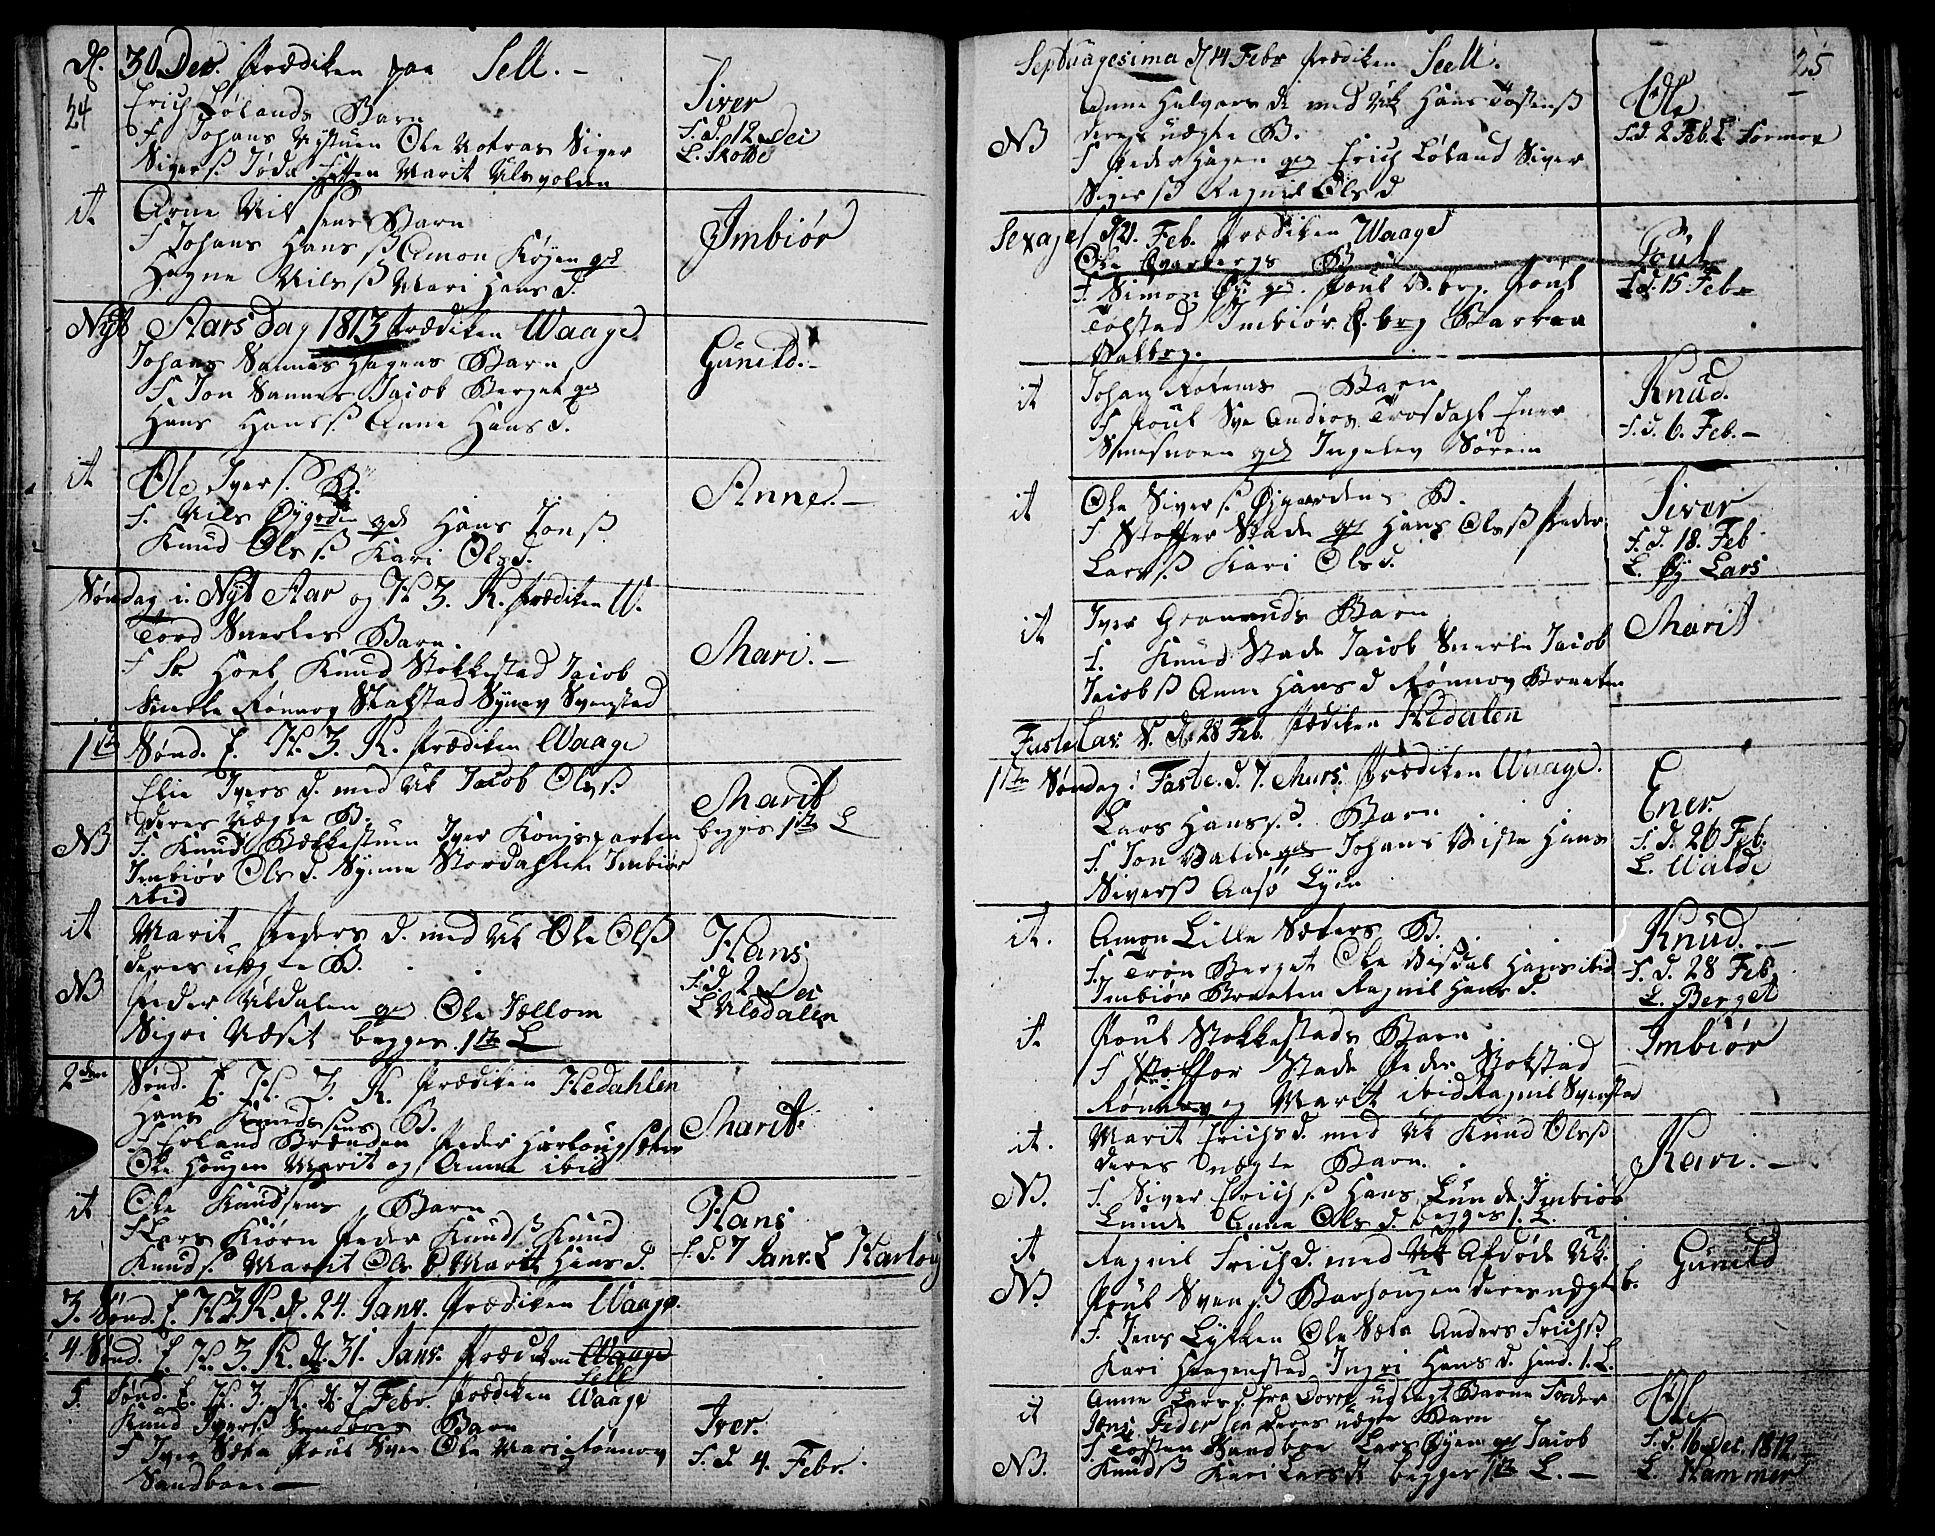 SAH, Vågå prestekontor, Ministerialbok nr. 2, 1810-1815, s. 24-25